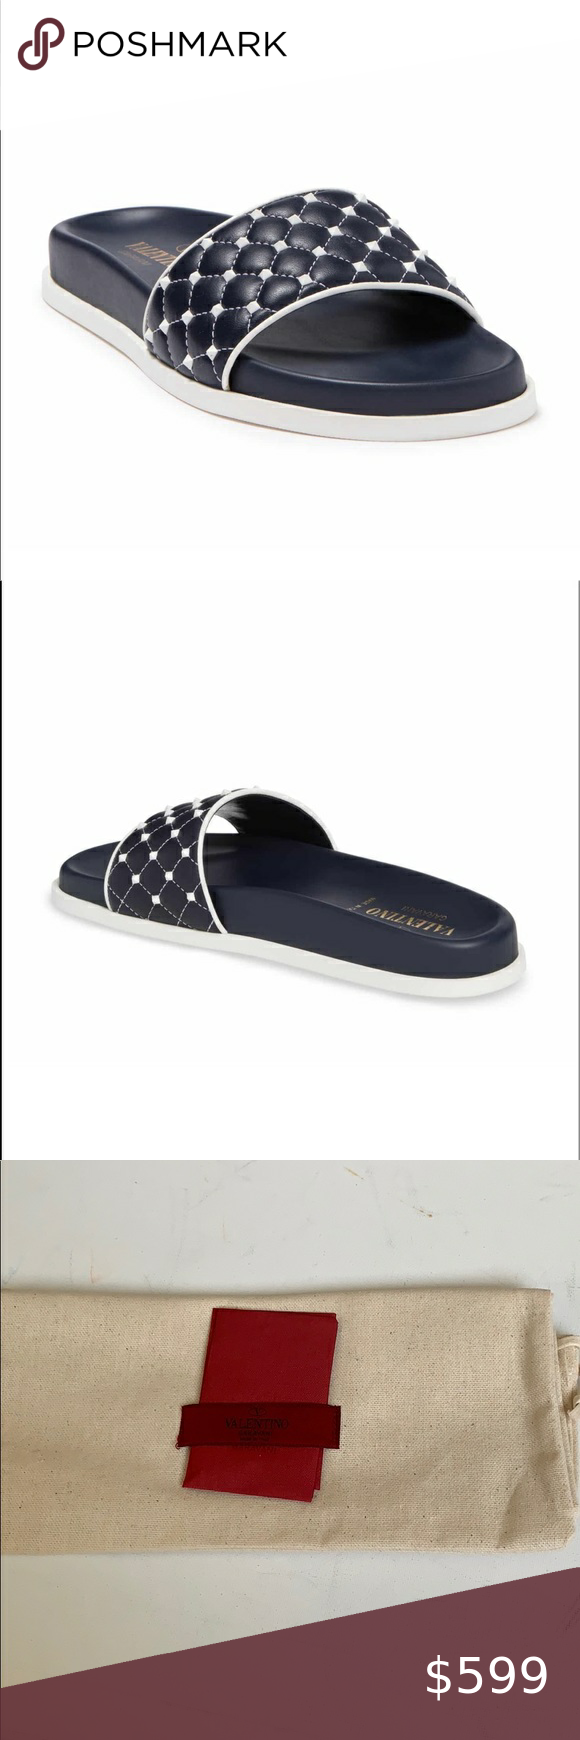 Sold Valentino Rockstuds Slide Price Firm In 2020 Valentino Rockstud Valentino Garavani Shoes Sandal Fashion